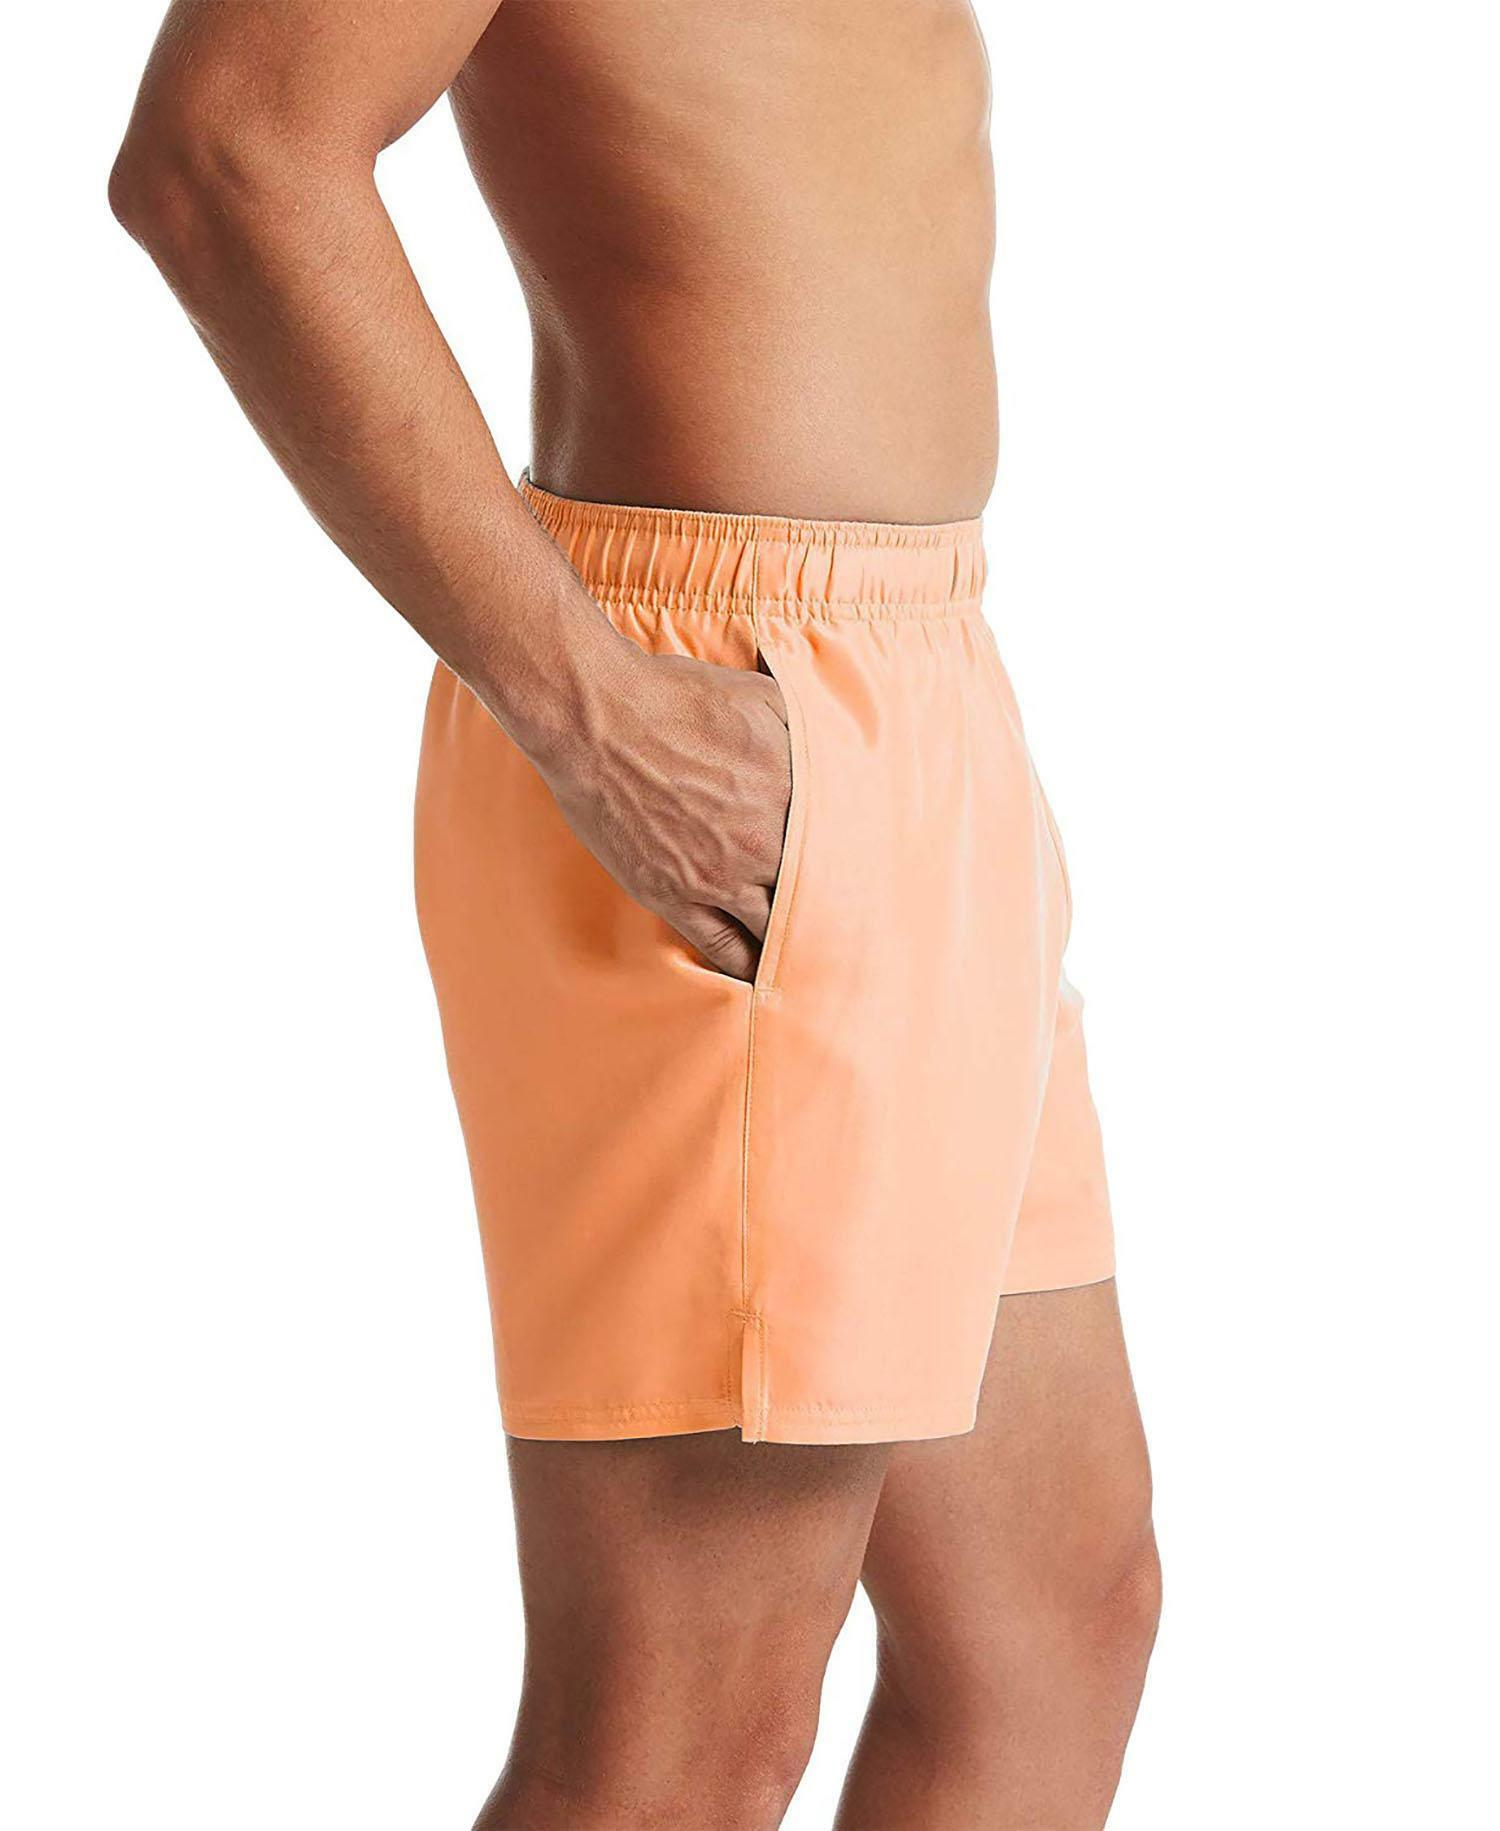 nike costume uomo arancione fluo ness9502849